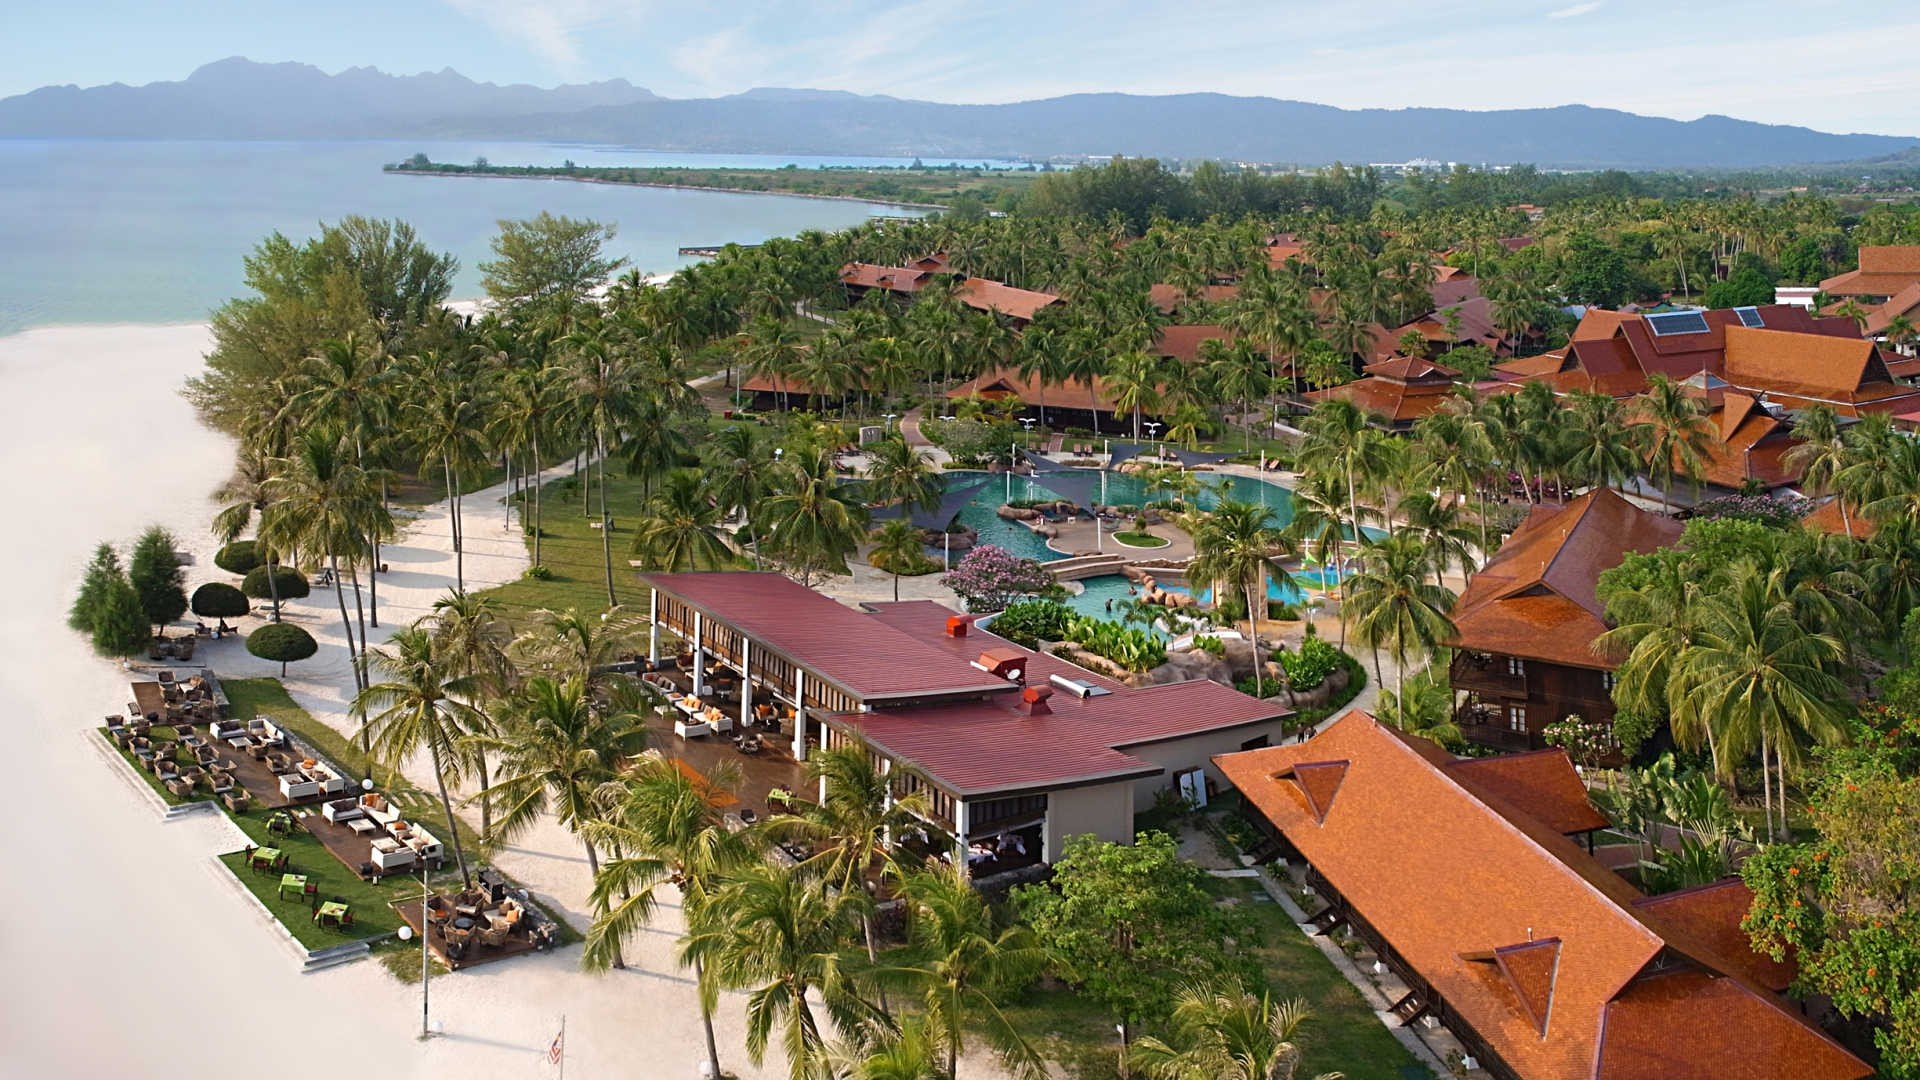 هتل مریتاس پلانگی بیچ ریزورت لنکاوی